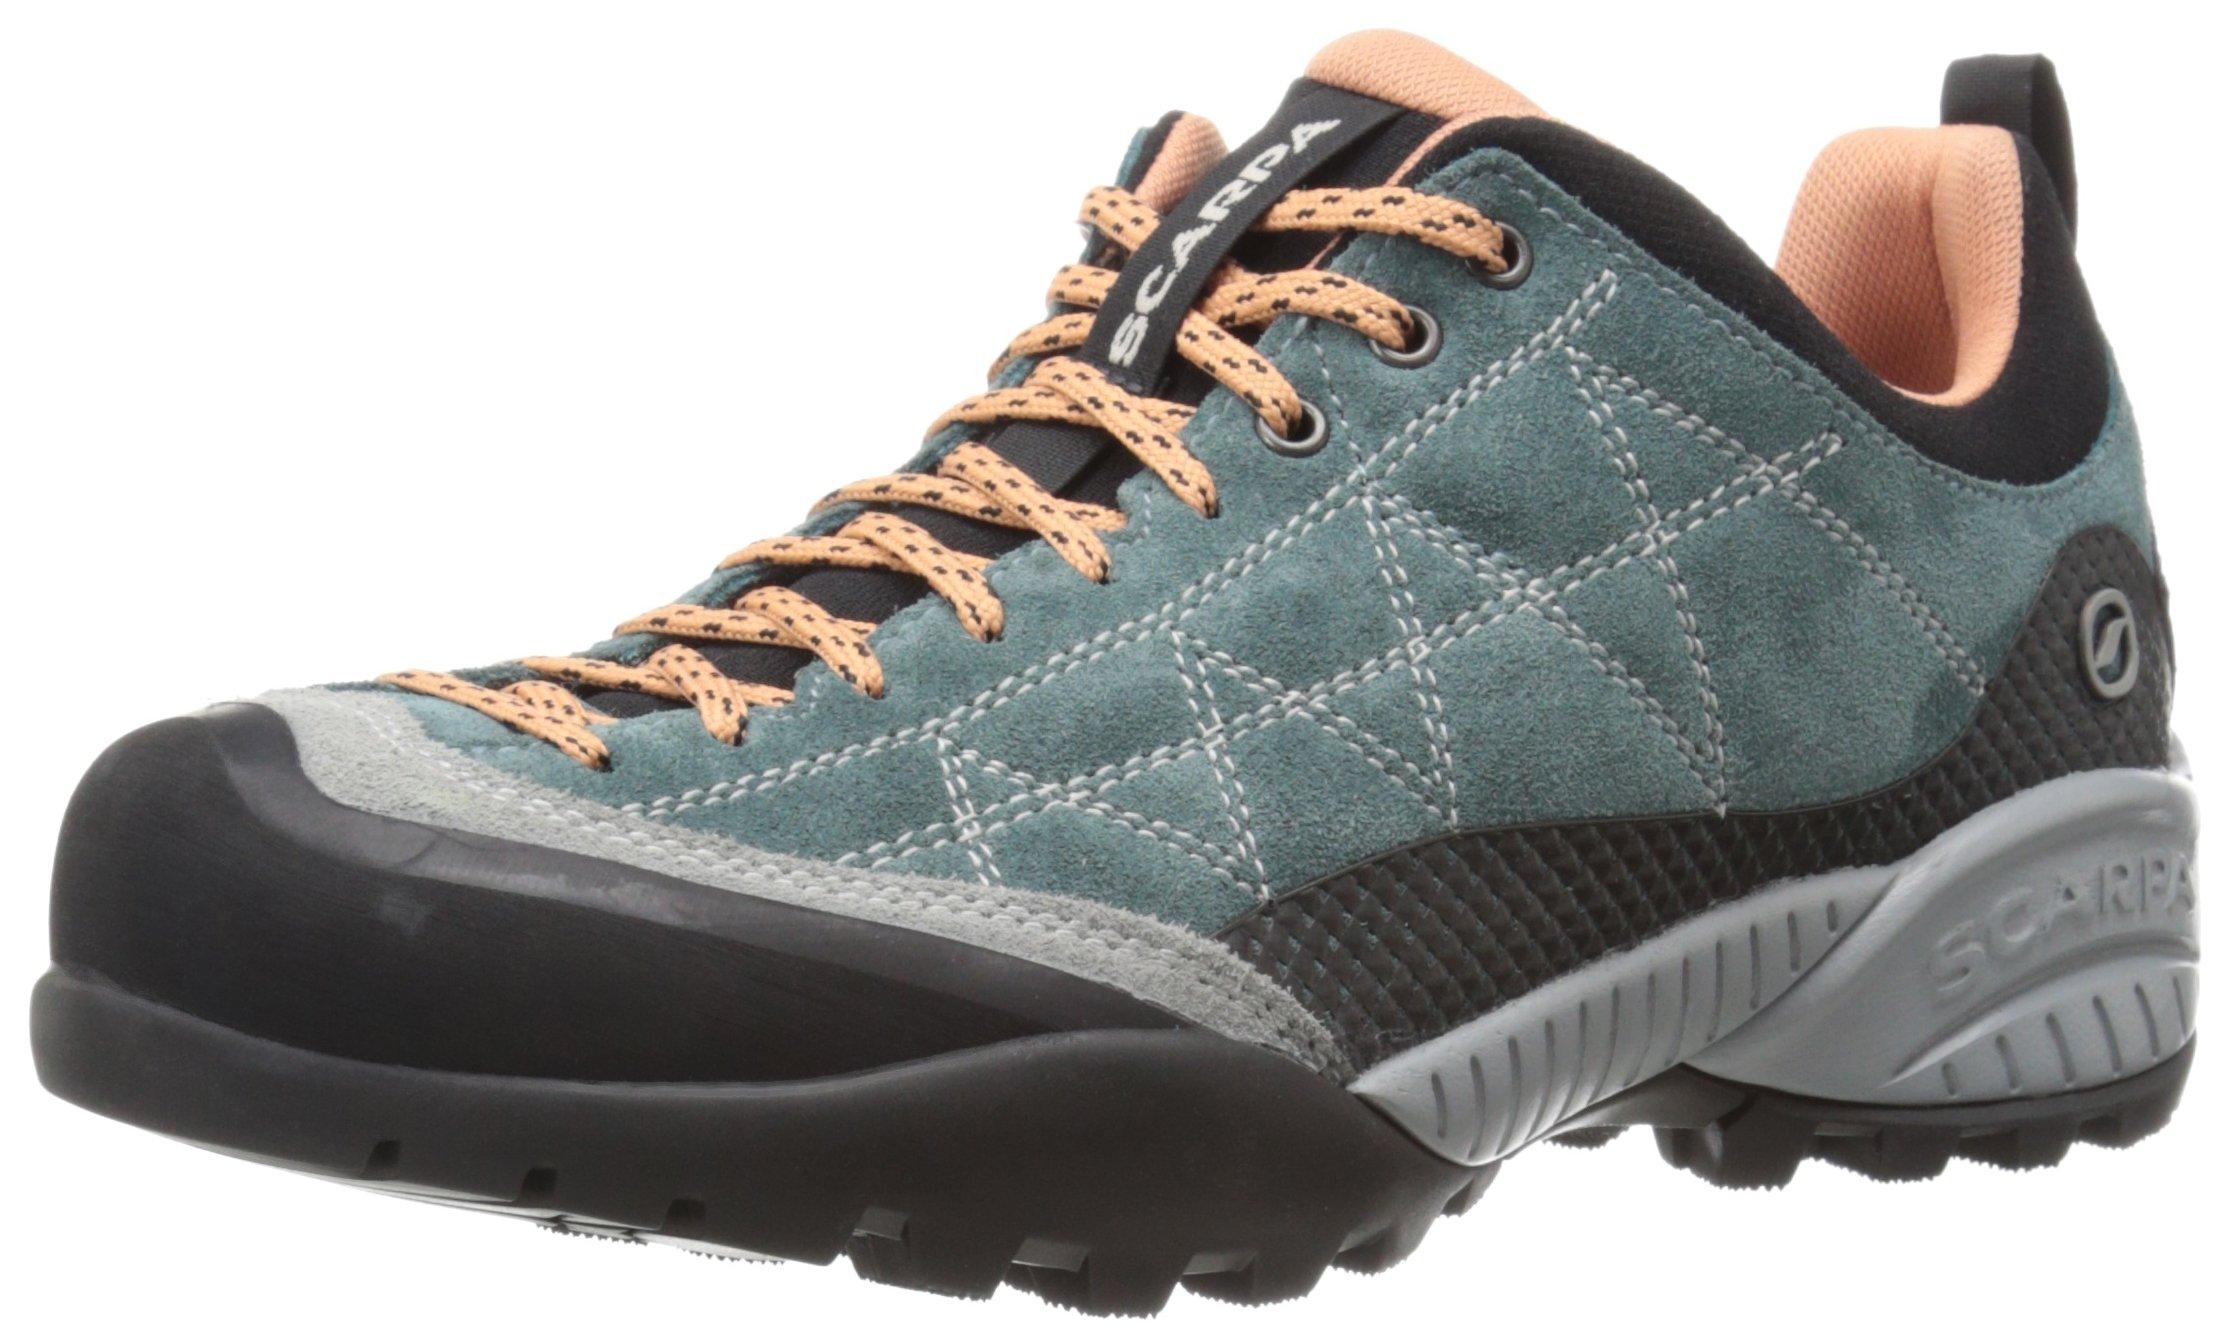 Scarpa Women's ZEN Pro Hiking Shoe, Nile Blue/Salmon, 41 EU/9 M US